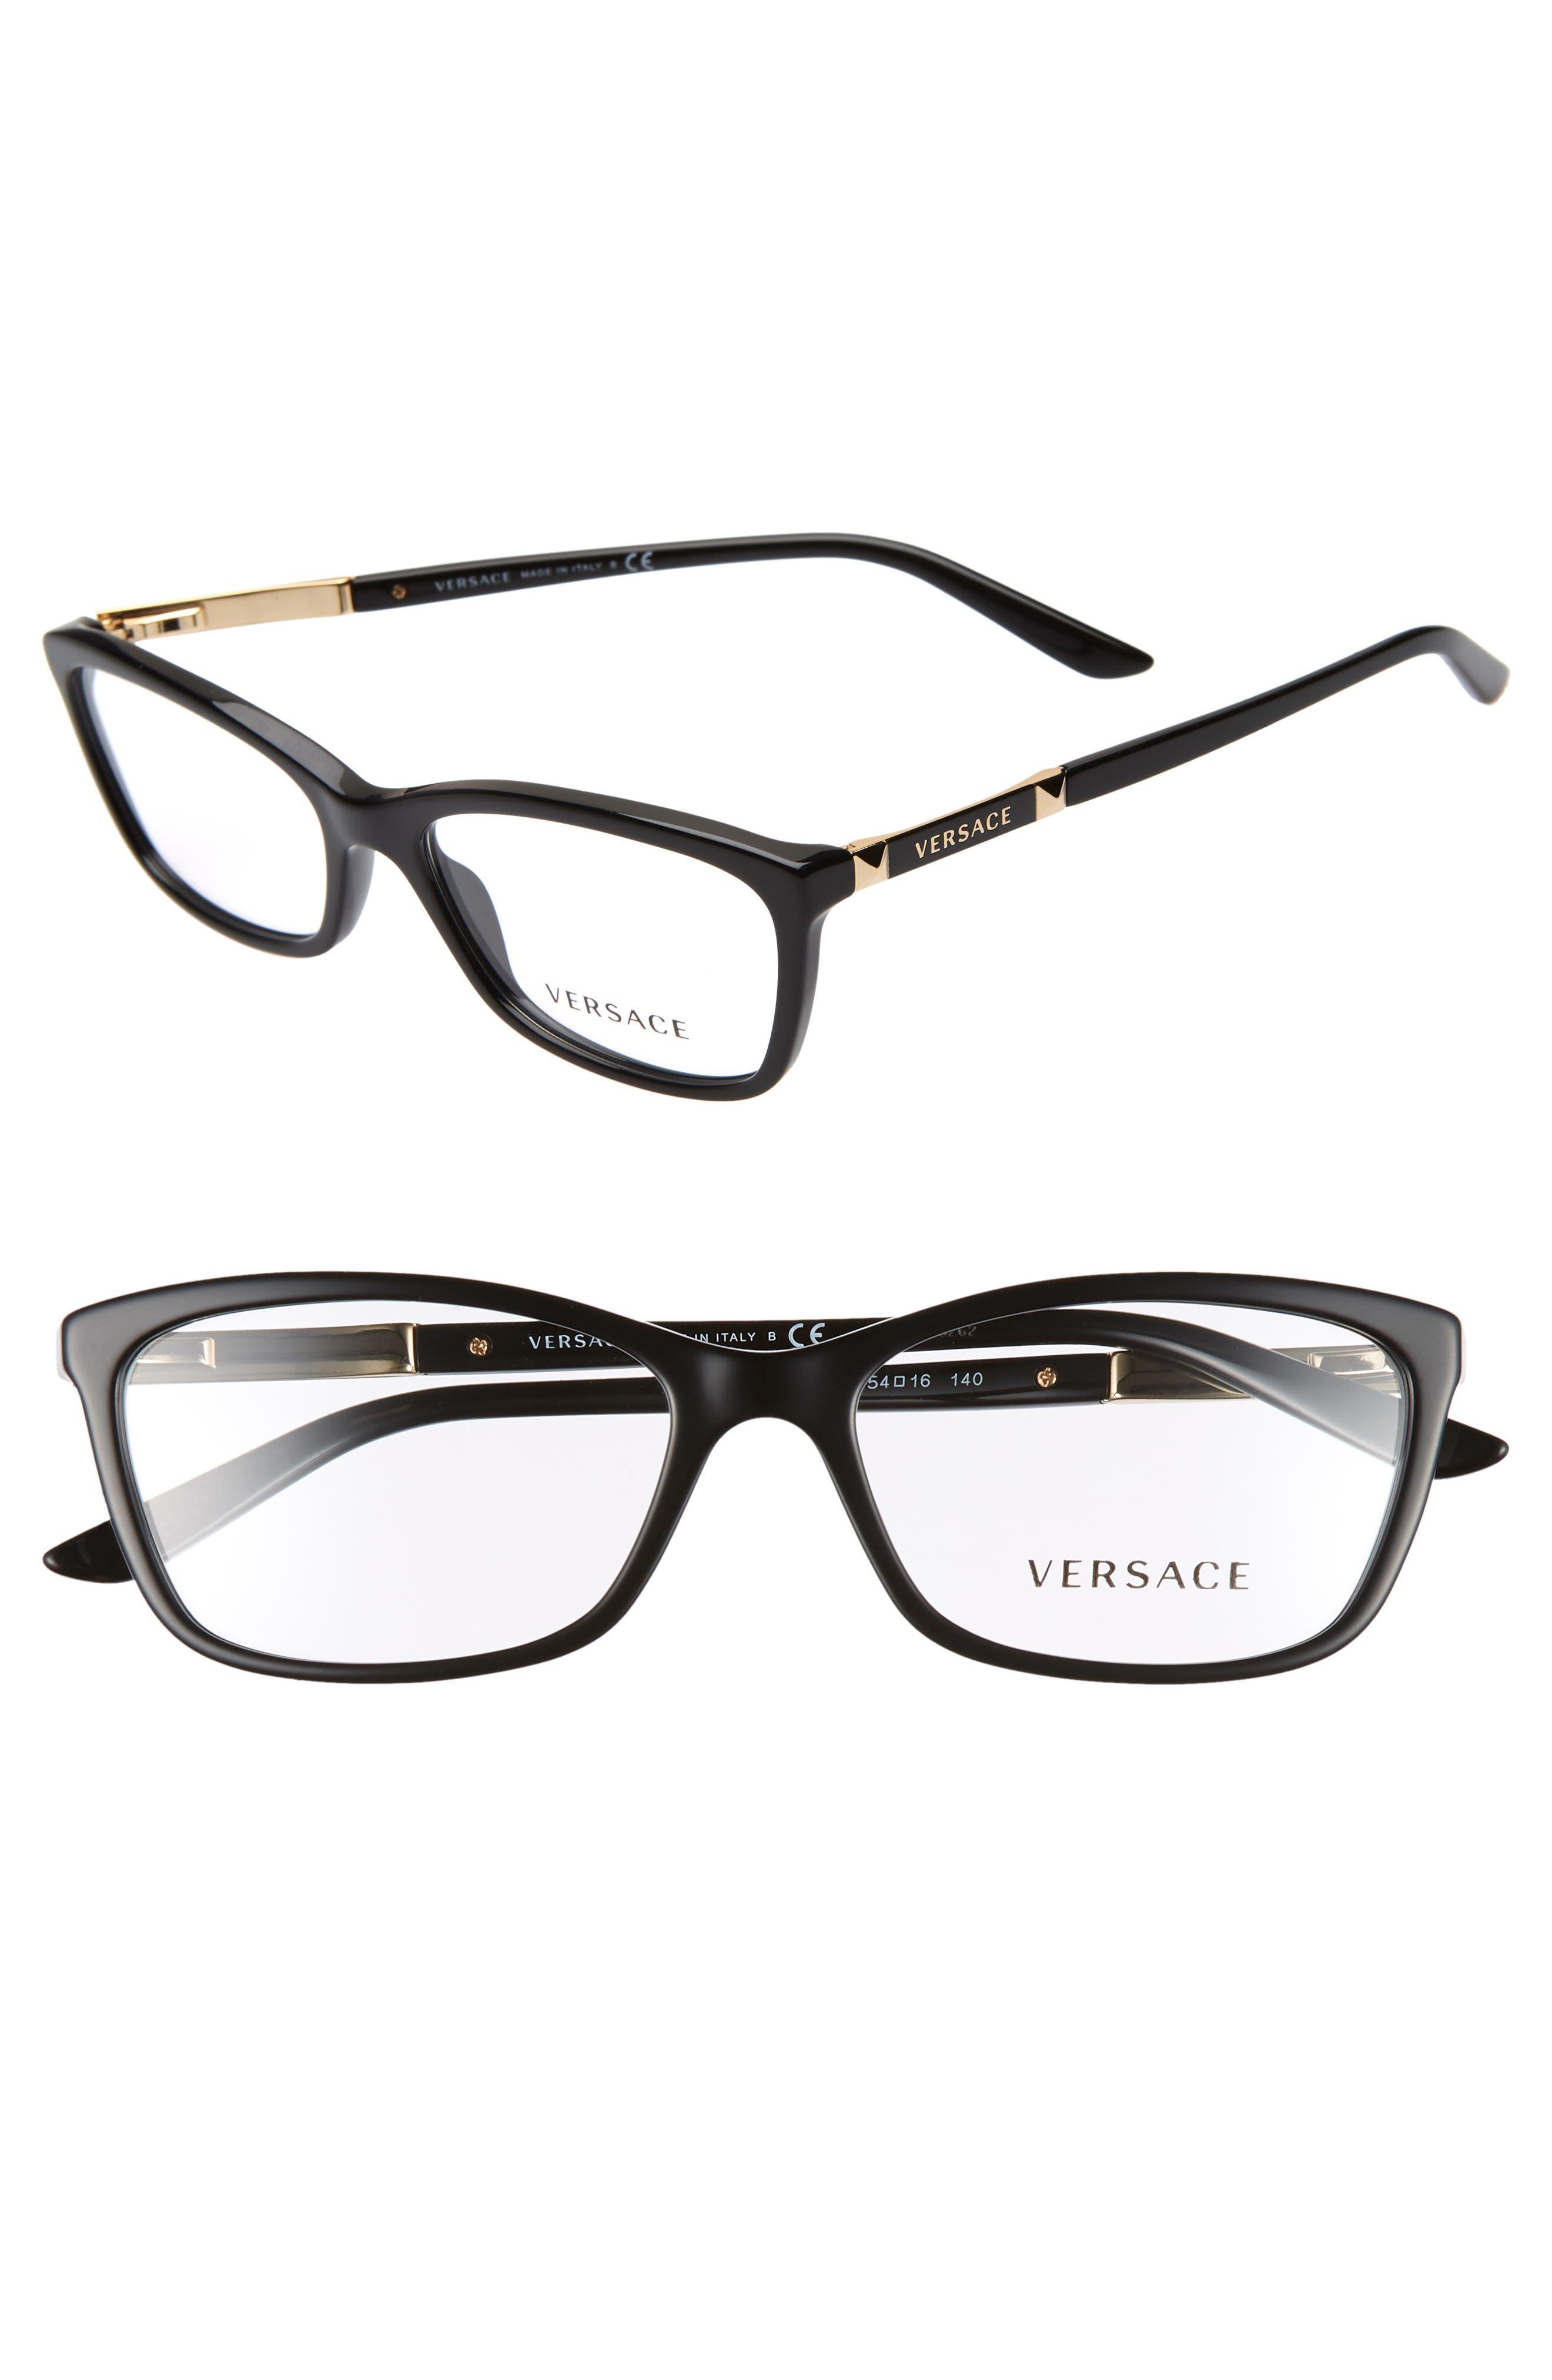 VERSACE,                             54mm Optical Glasses,                             Main thumbnail 1, color,                             BLACK